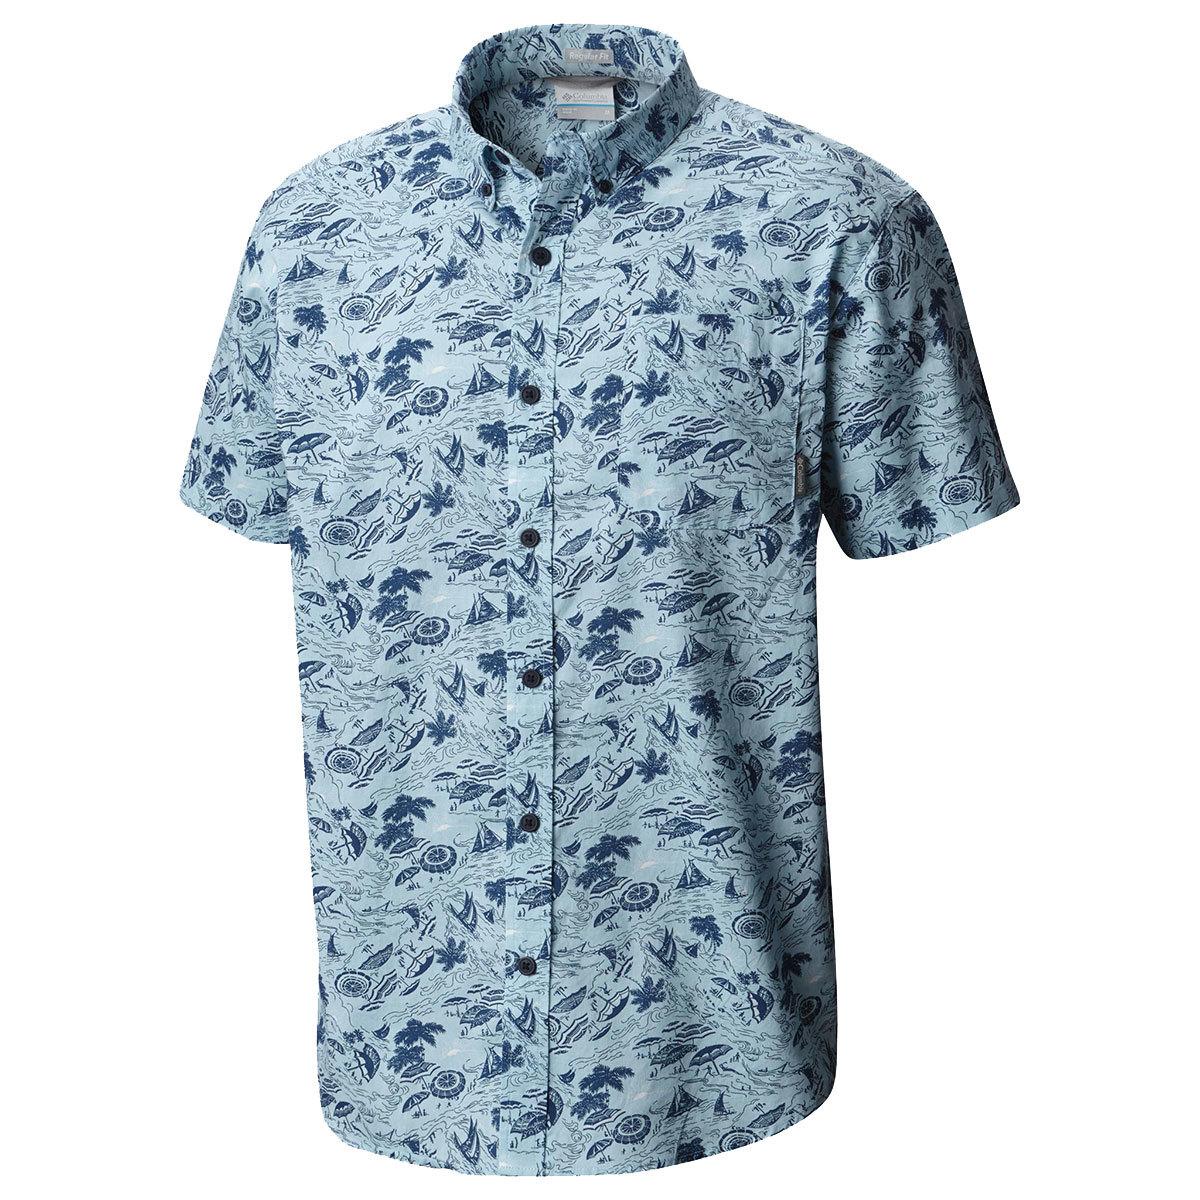 "Columbia Men's Rapid Riversa""  Printed Short-Sleeve Shirt - Blue, XL"